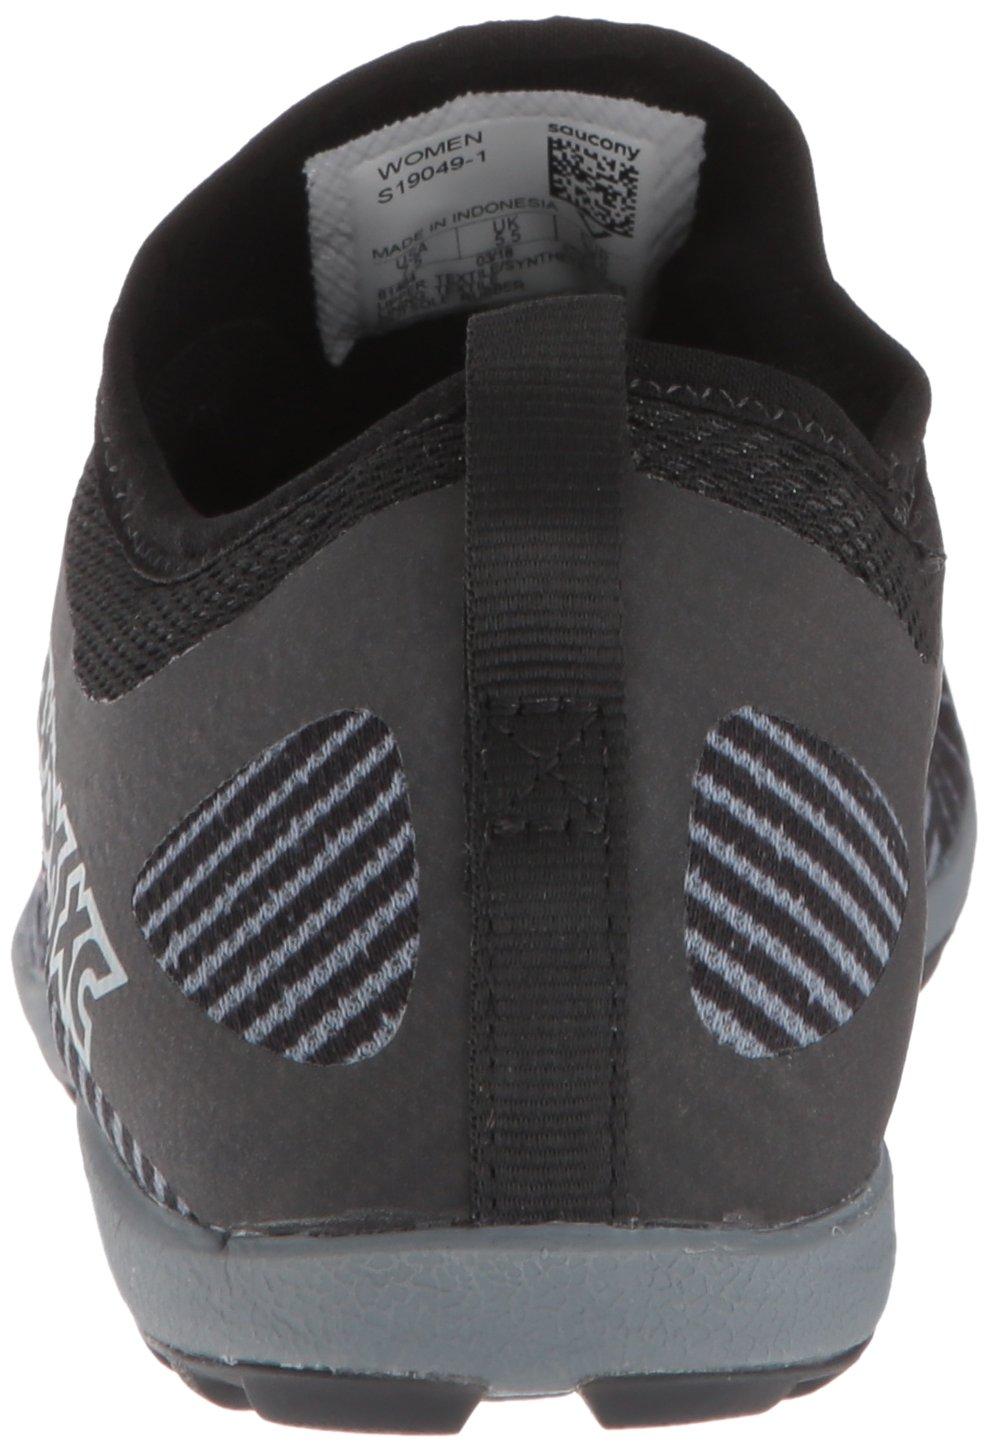 Saucony Women's Havok XC2 Flat Track Shoe Black/Grey/Vizi-red 7 M US by Saucony (Image #2)